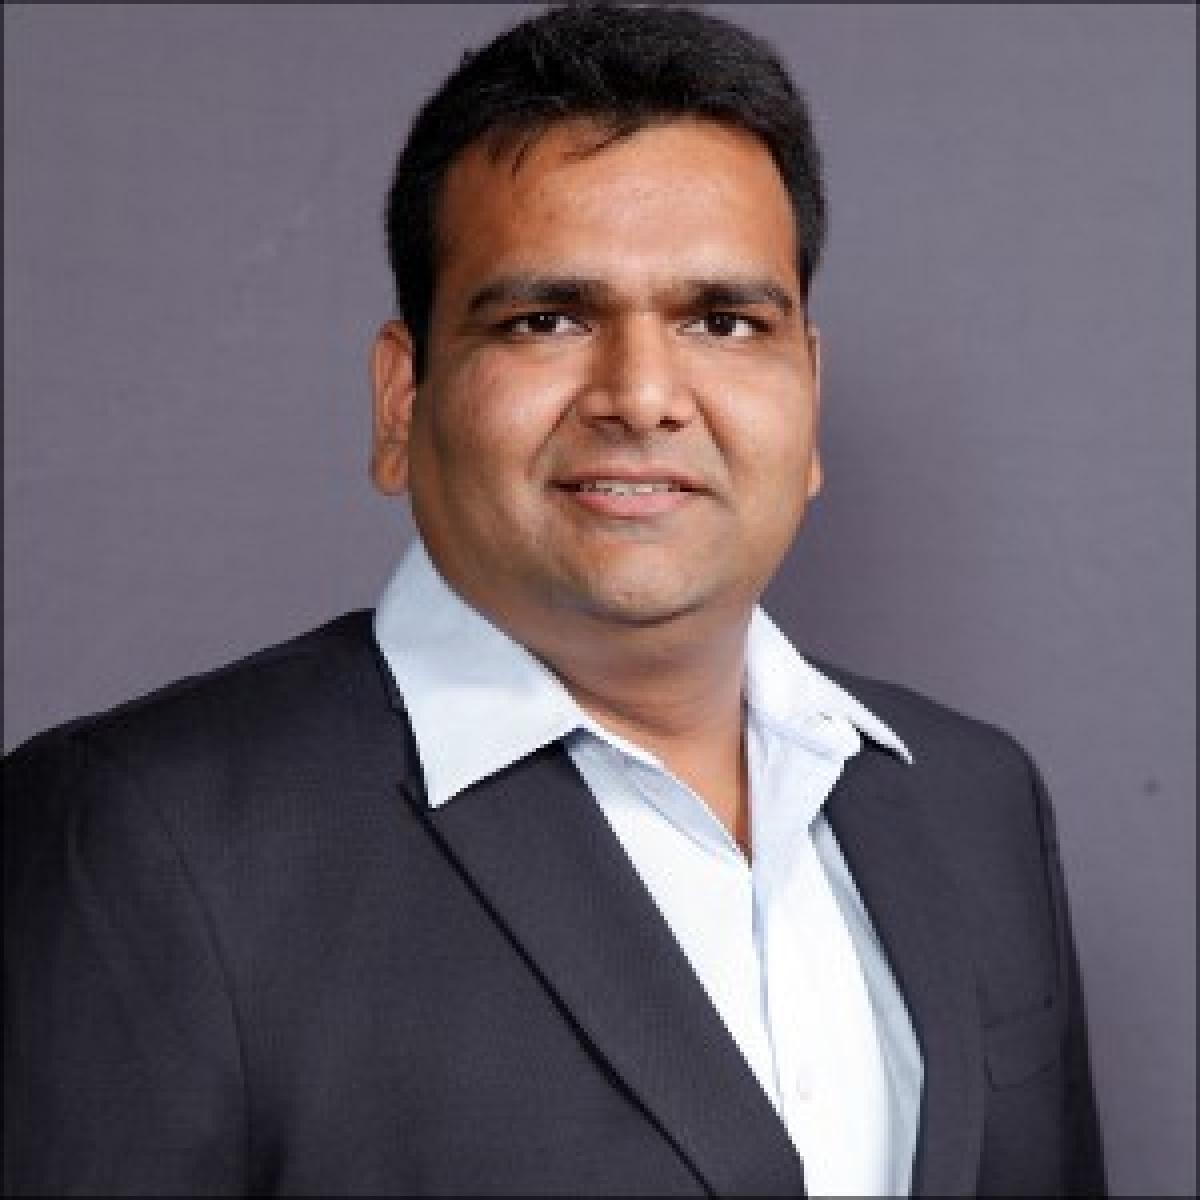 BARC India to host digital measurement roadshows in Delhi, Mumbai and Bengaluru